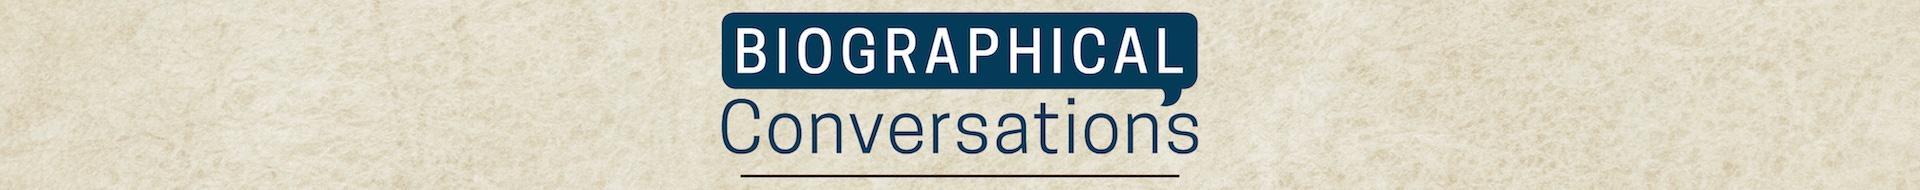 Biographical Conversation Logo Banner